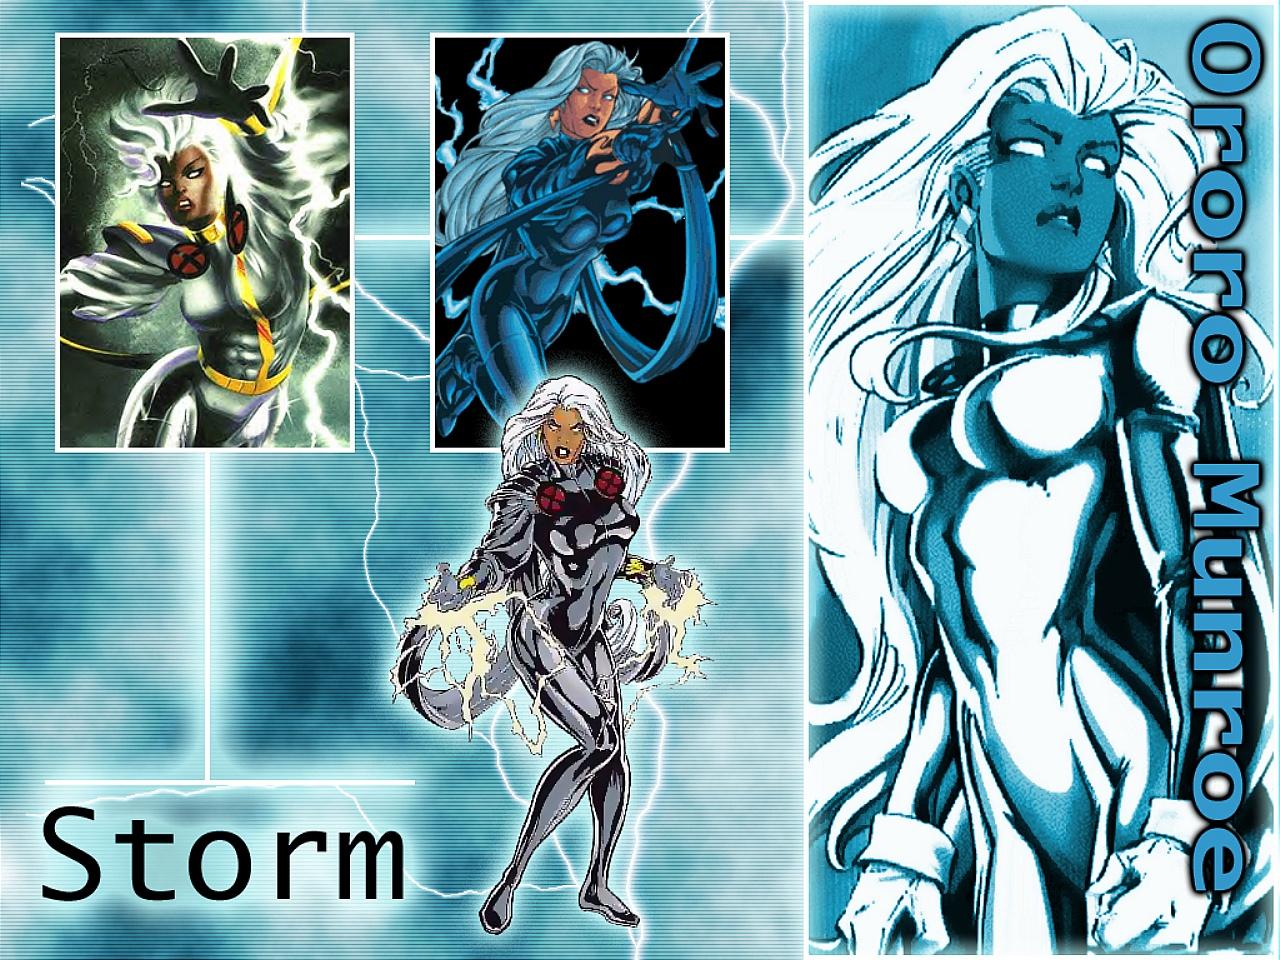 Storm Ororo Munroe wallpapers   X Men Wallpaper 1280x960